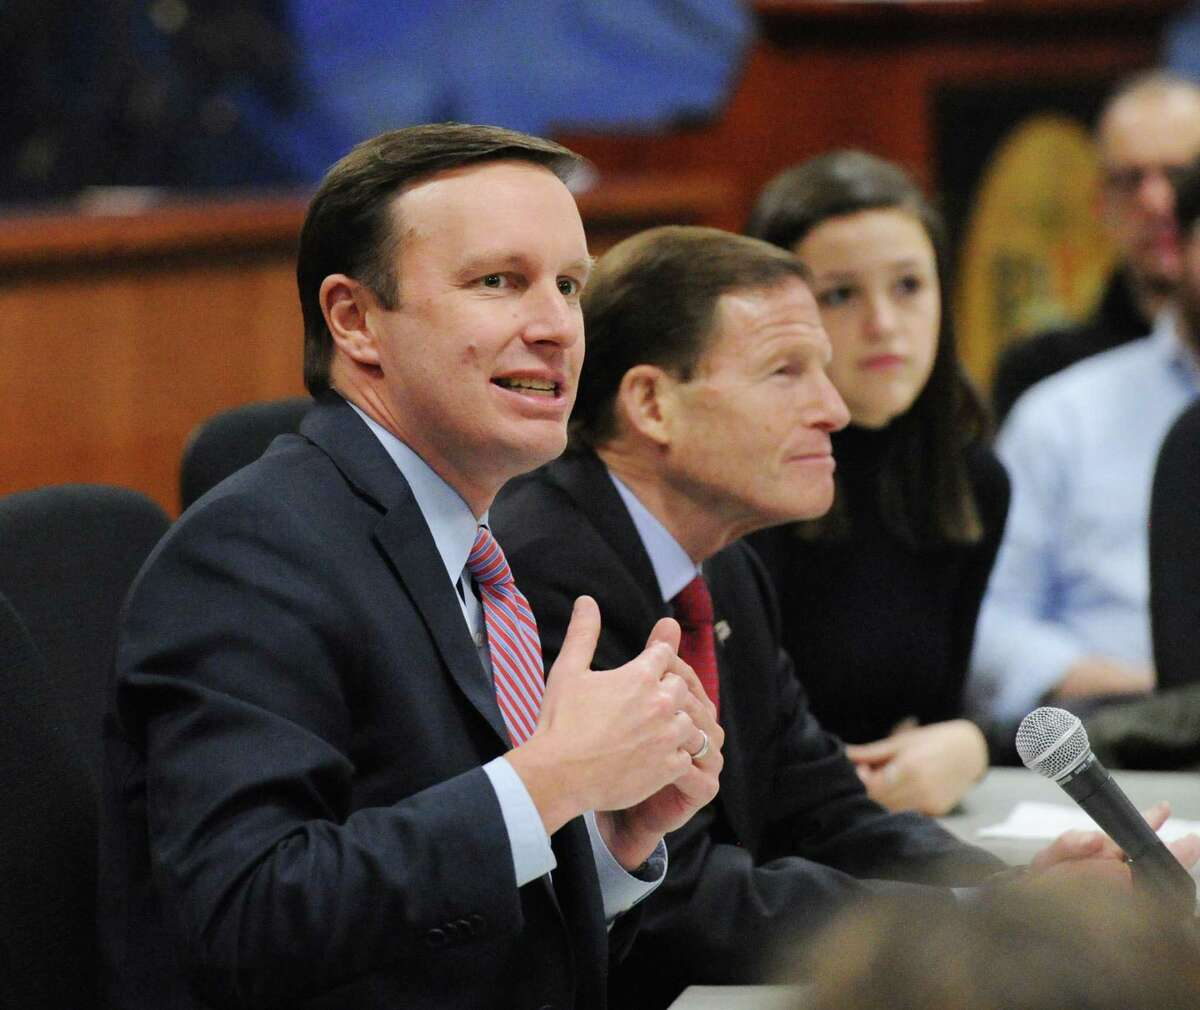 U.S. Senators Chris Murphy, left and Richard Blumenthal, in a file photo.